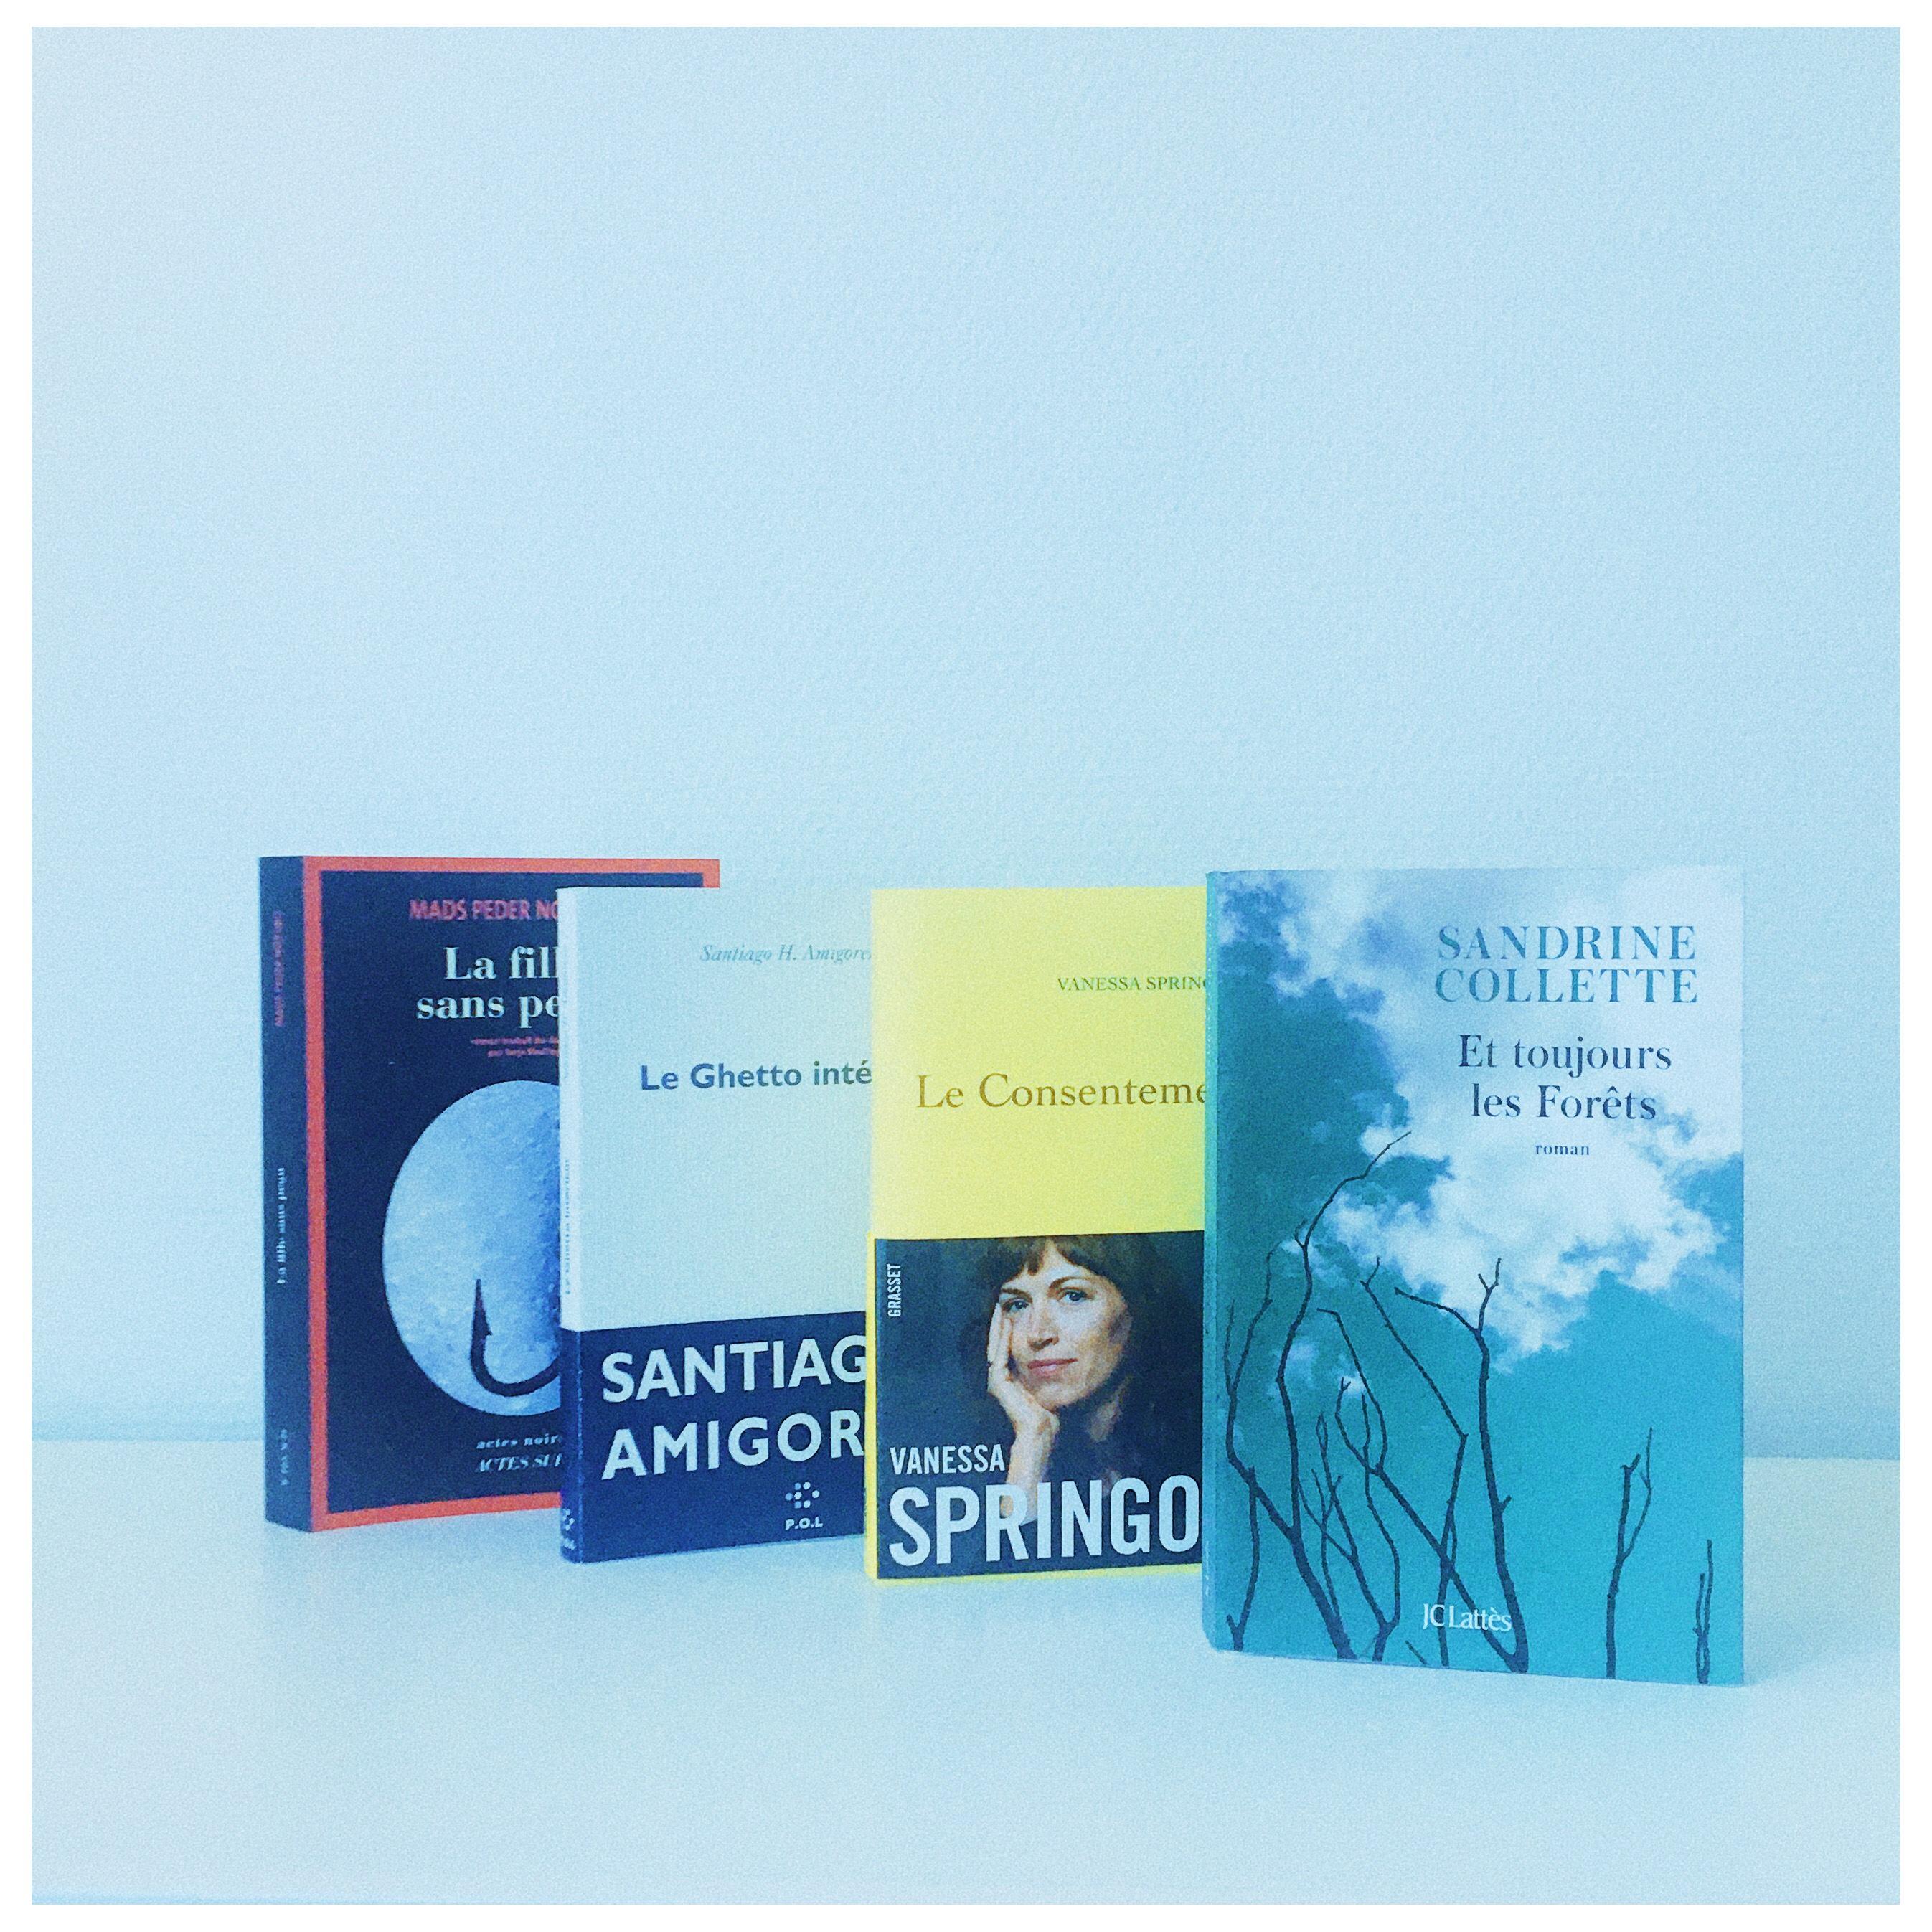 Grand Prix des Lectrices ELLE 2020 The Unamed Bookshelf